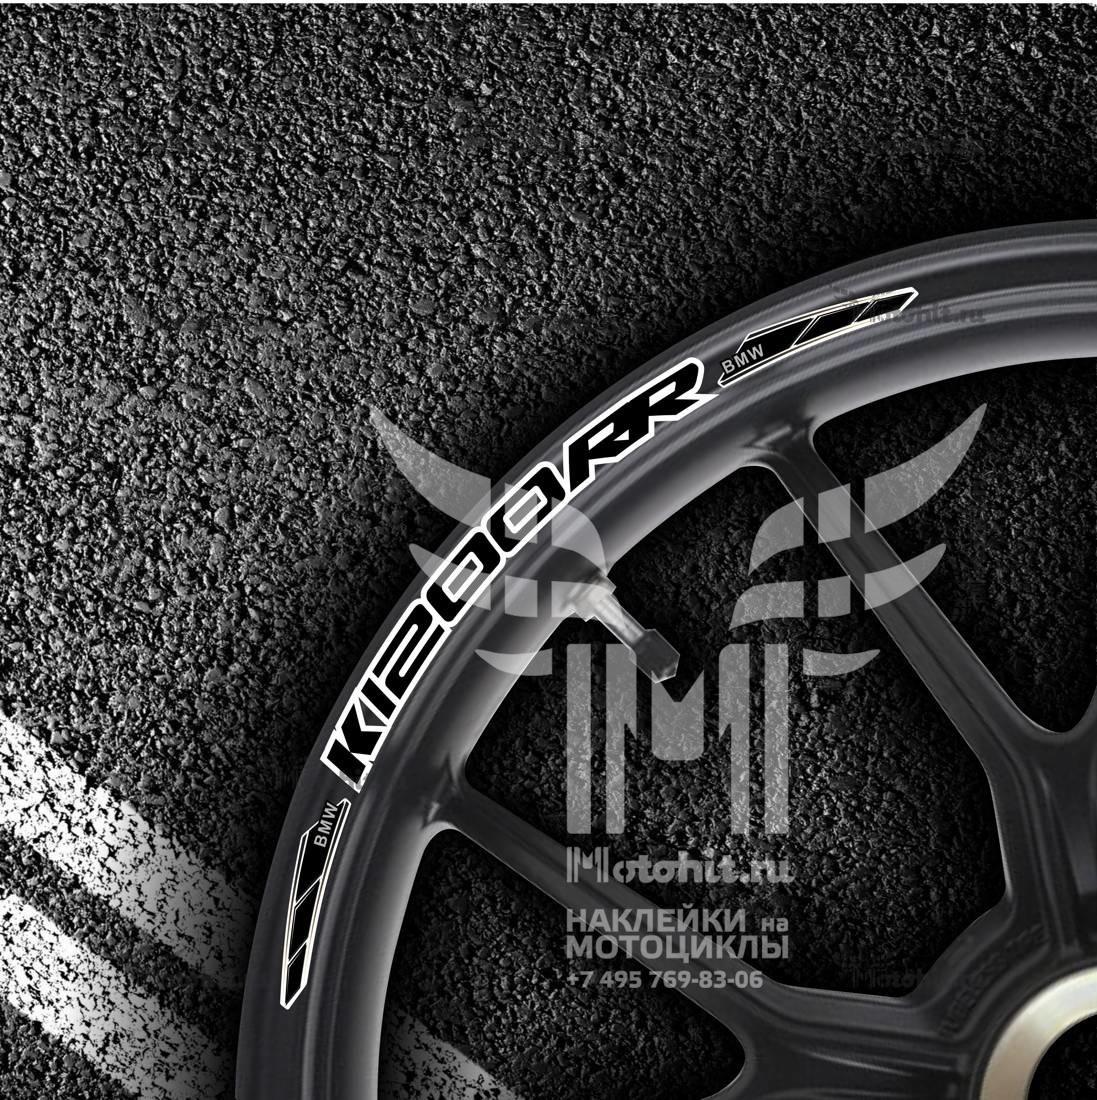 Комплект наклеек на обод колеса мотоцикла BMW K-1200-RR